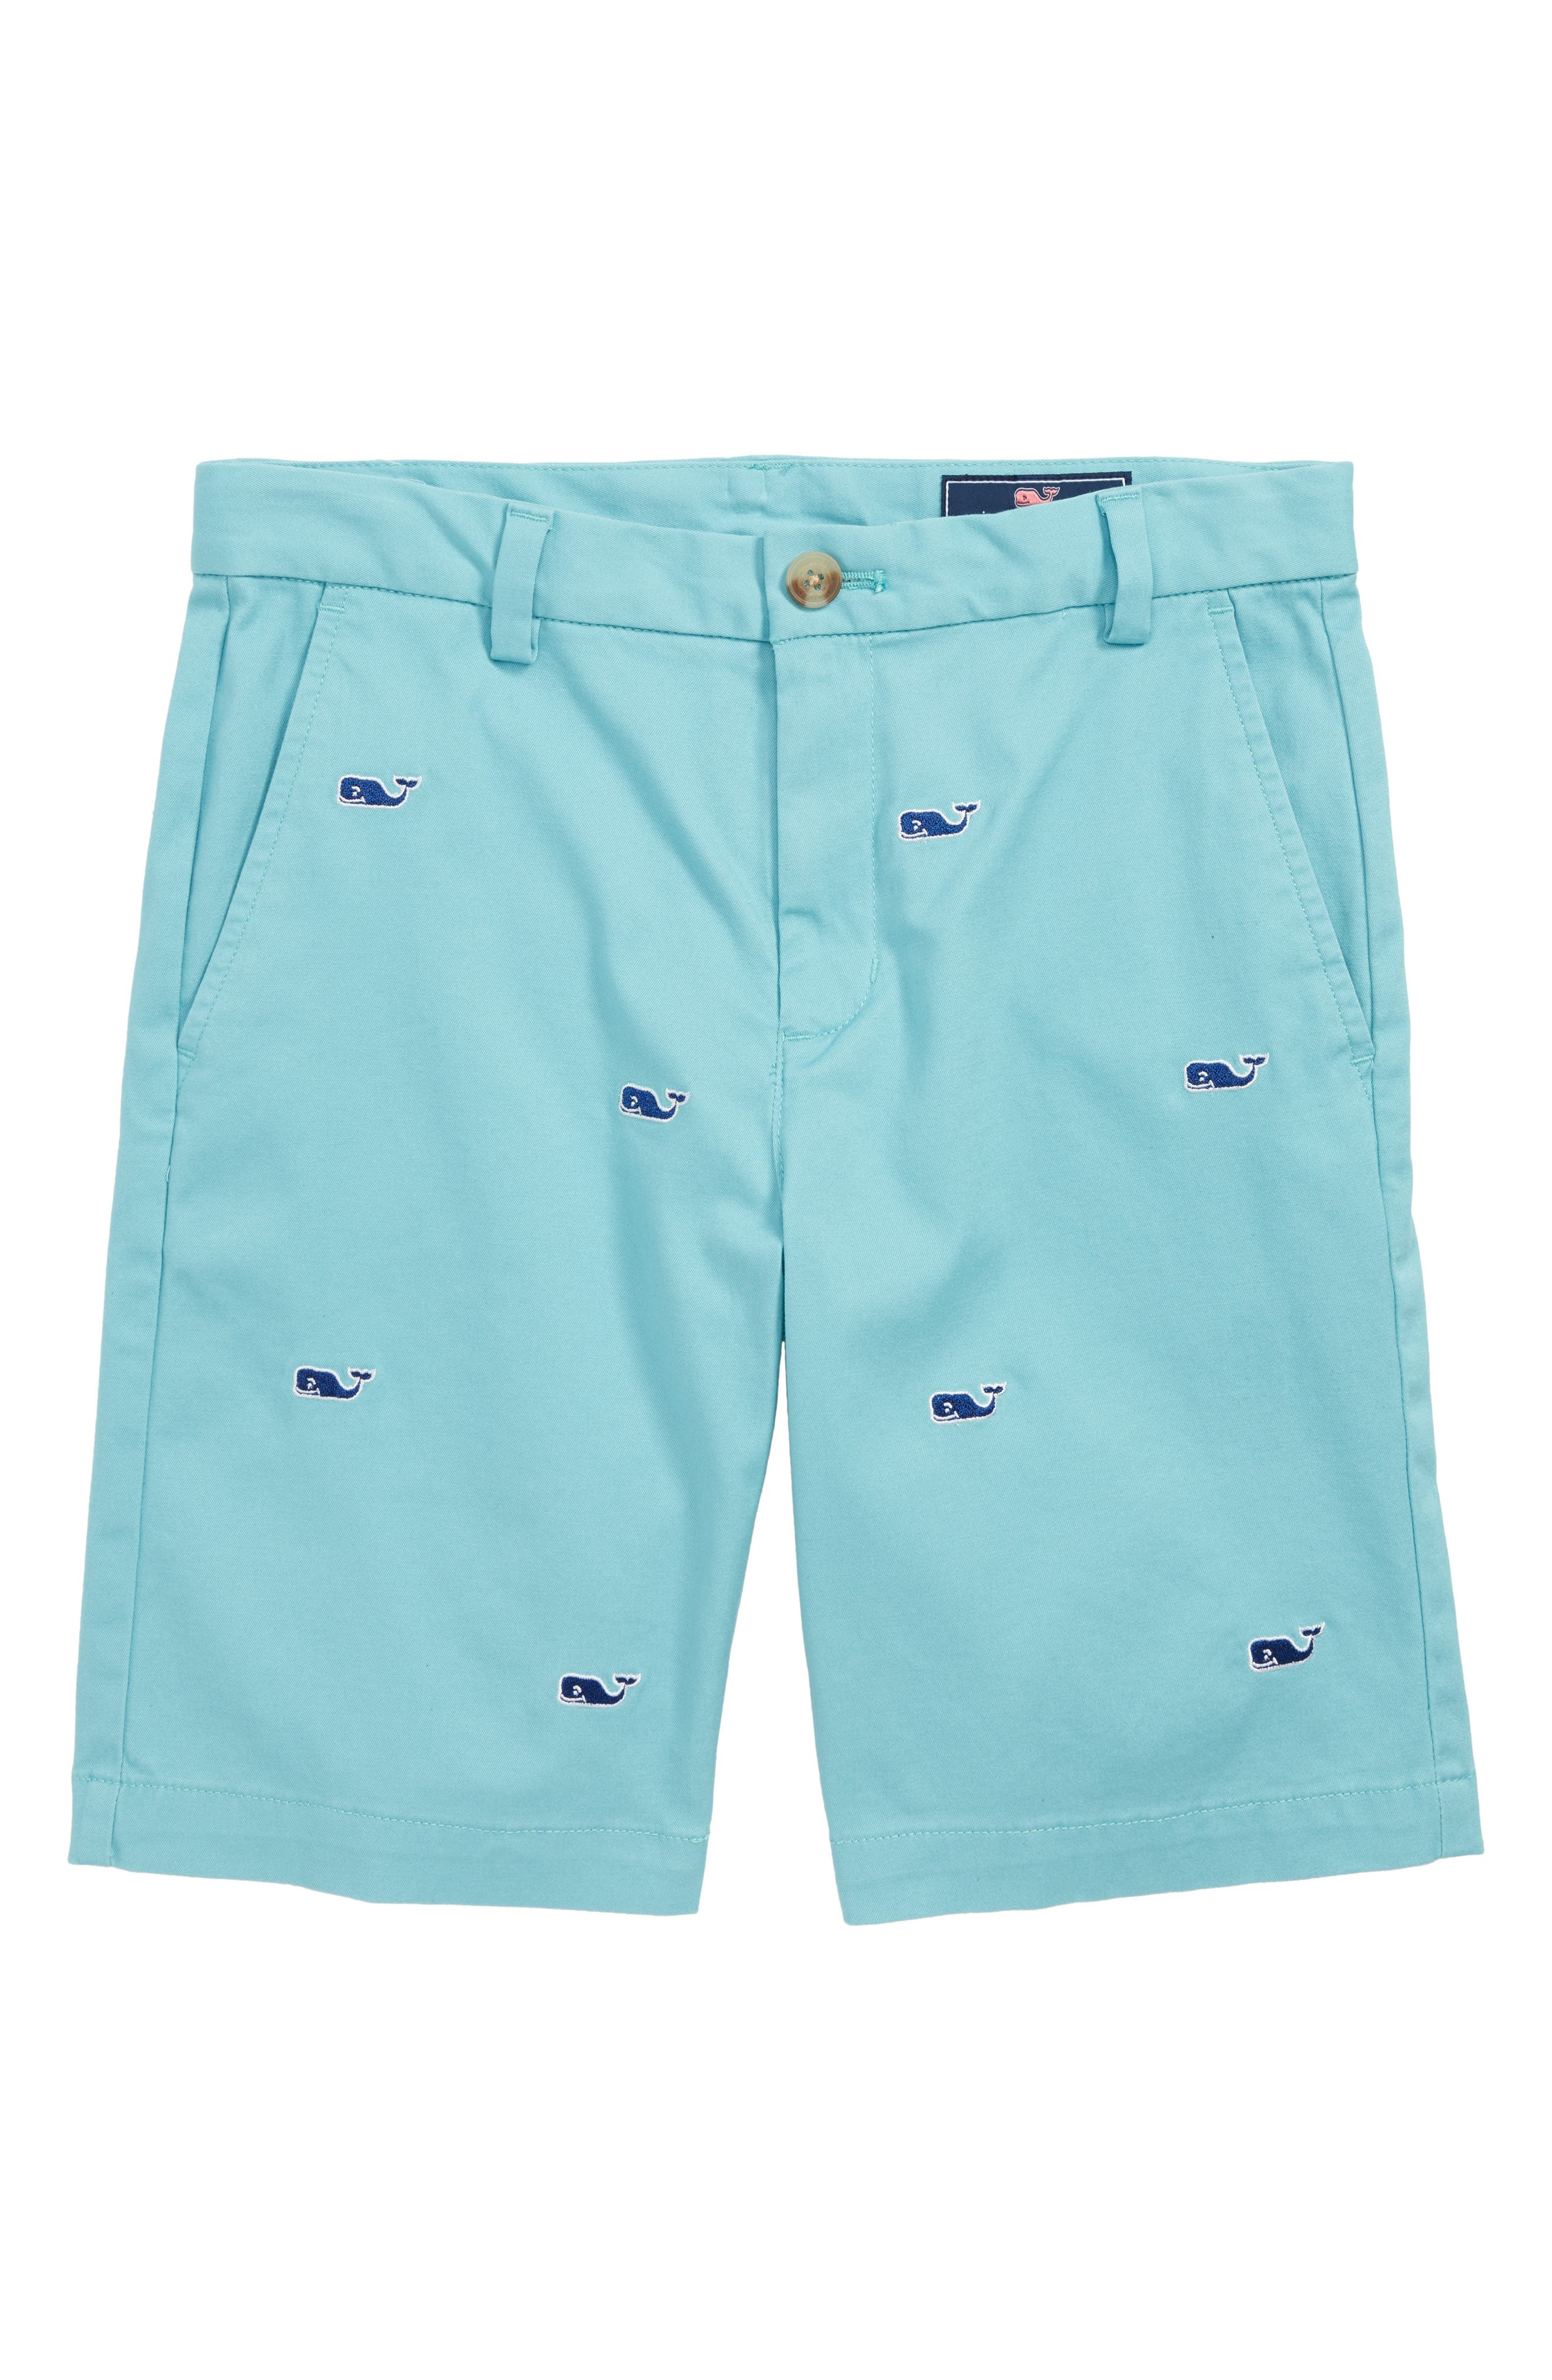 Embroidered Stretch Breaker Shorts,                             Main thumbnail 1, color,                             Aqua Ocean